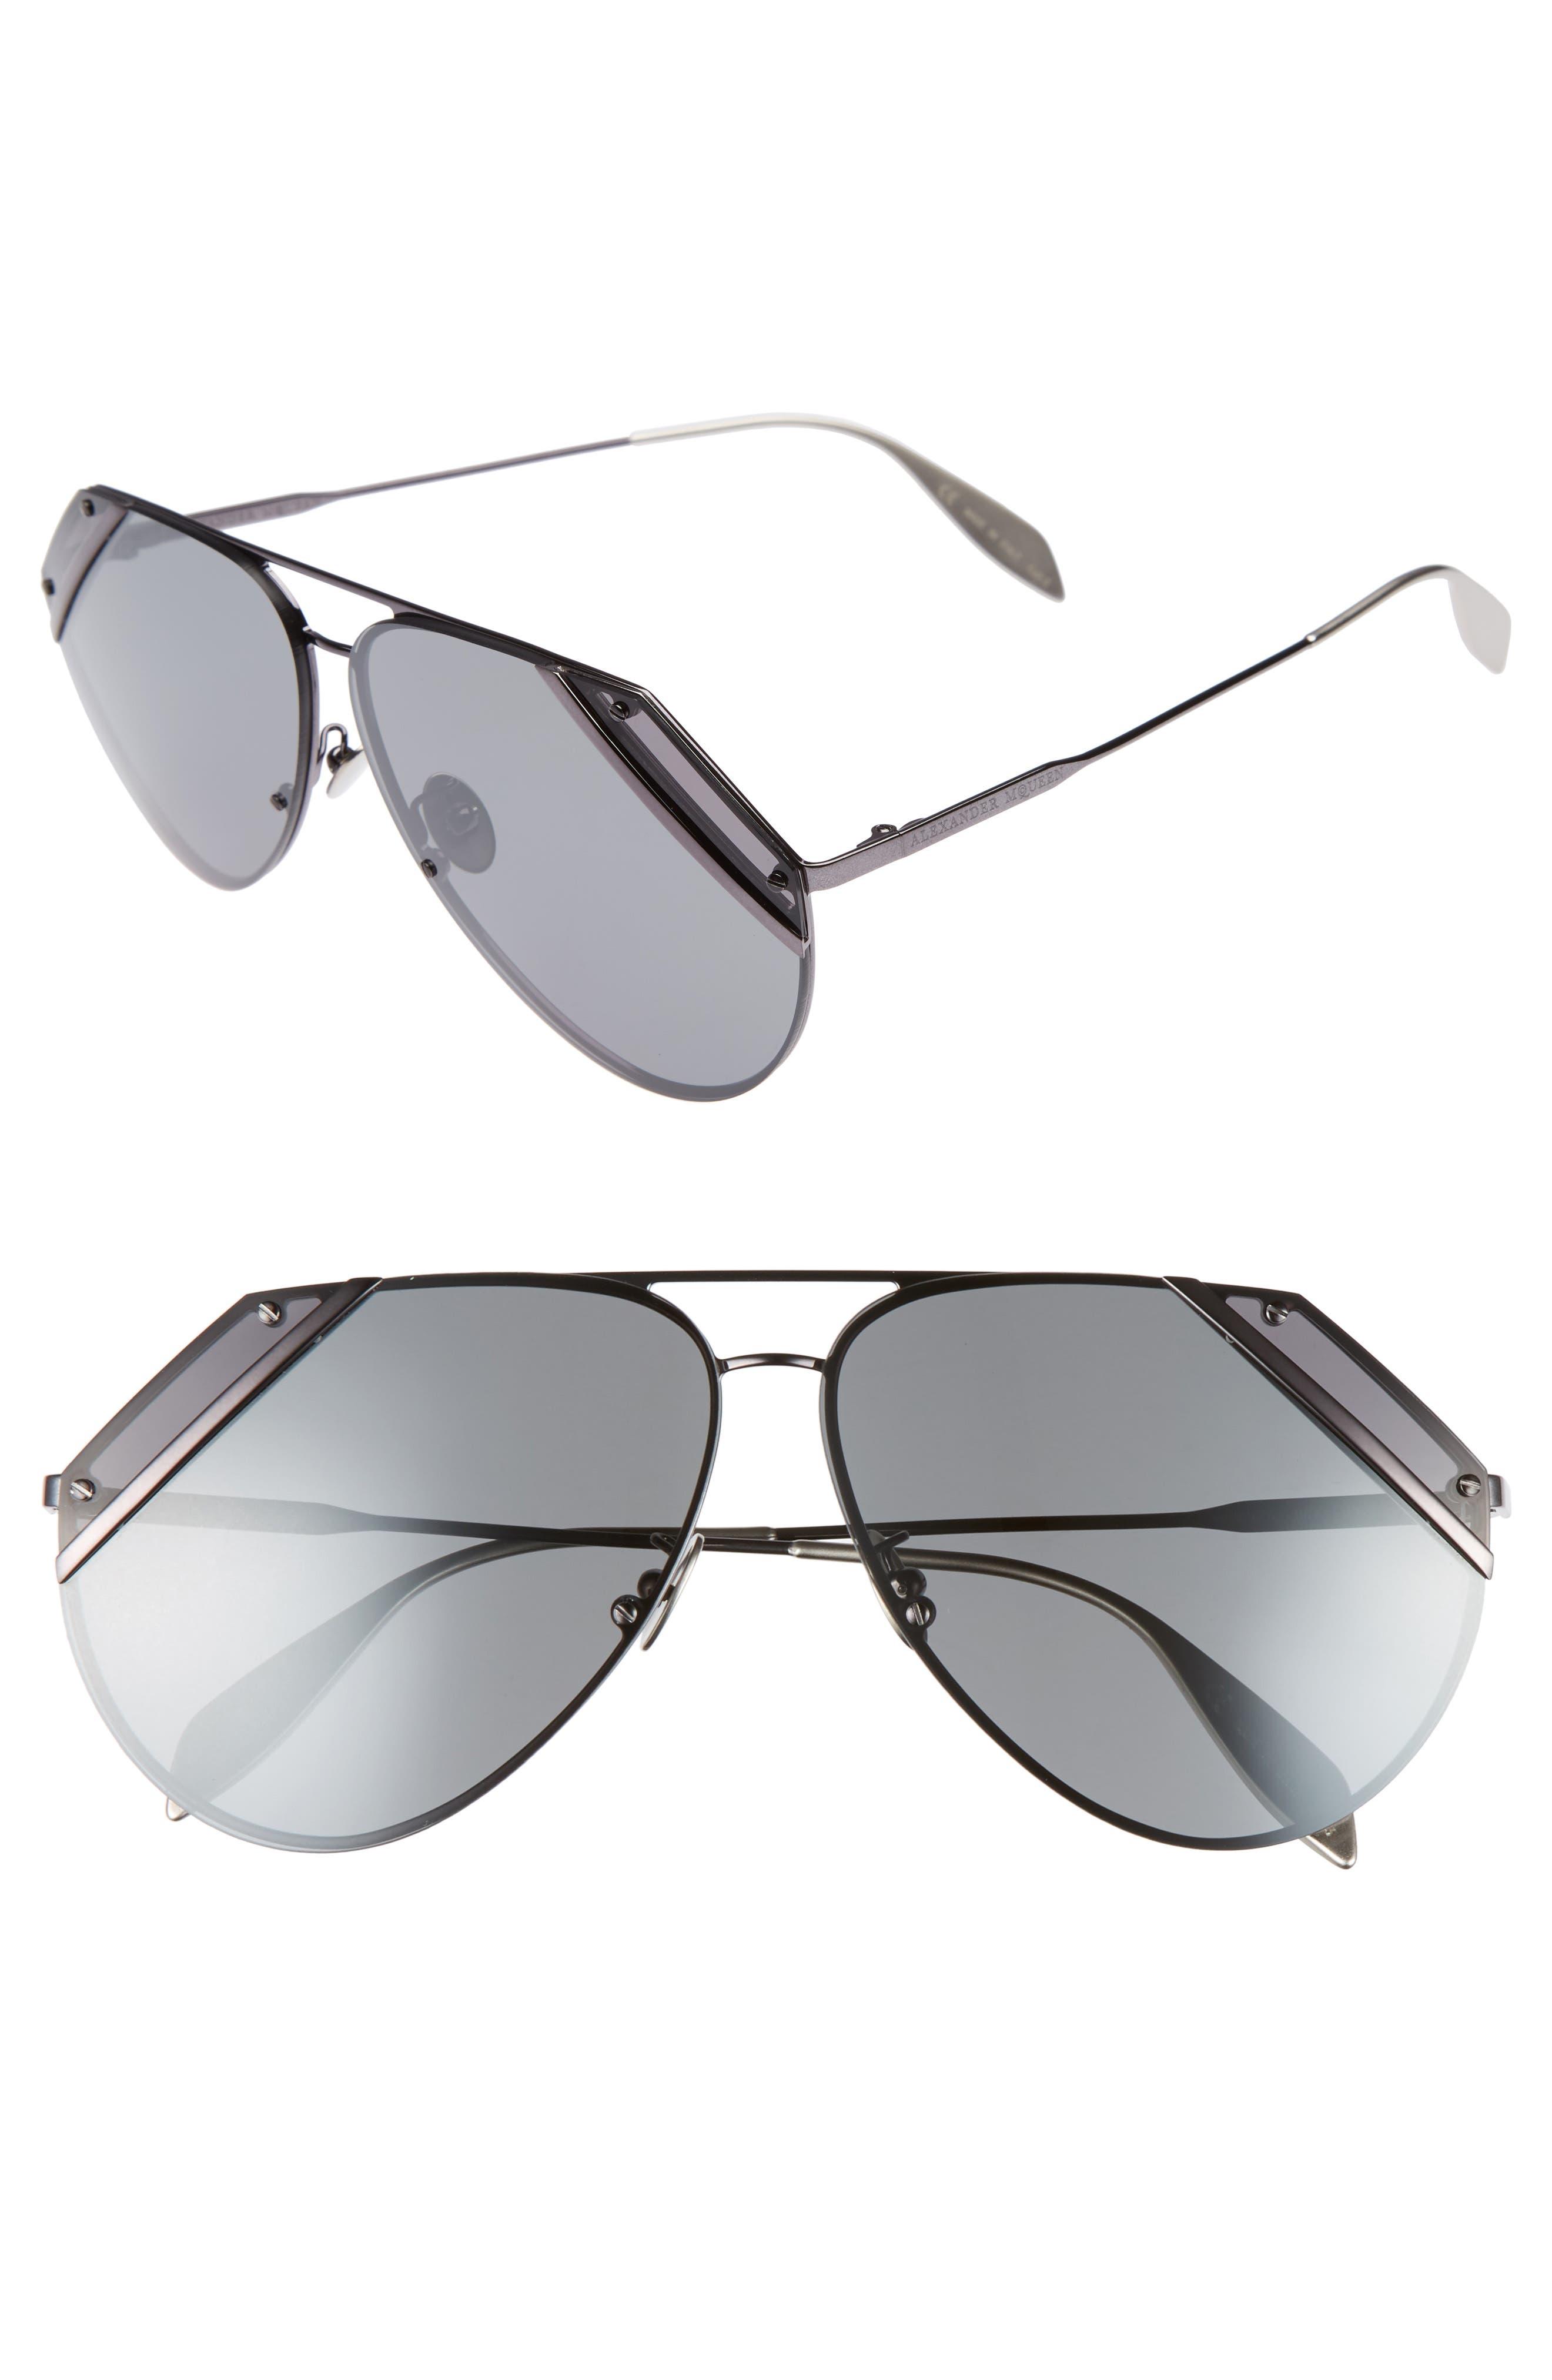 Alternate Image 1 Selected - Alexander McQueen 65mm Snip Frame Aviator Sunglasses